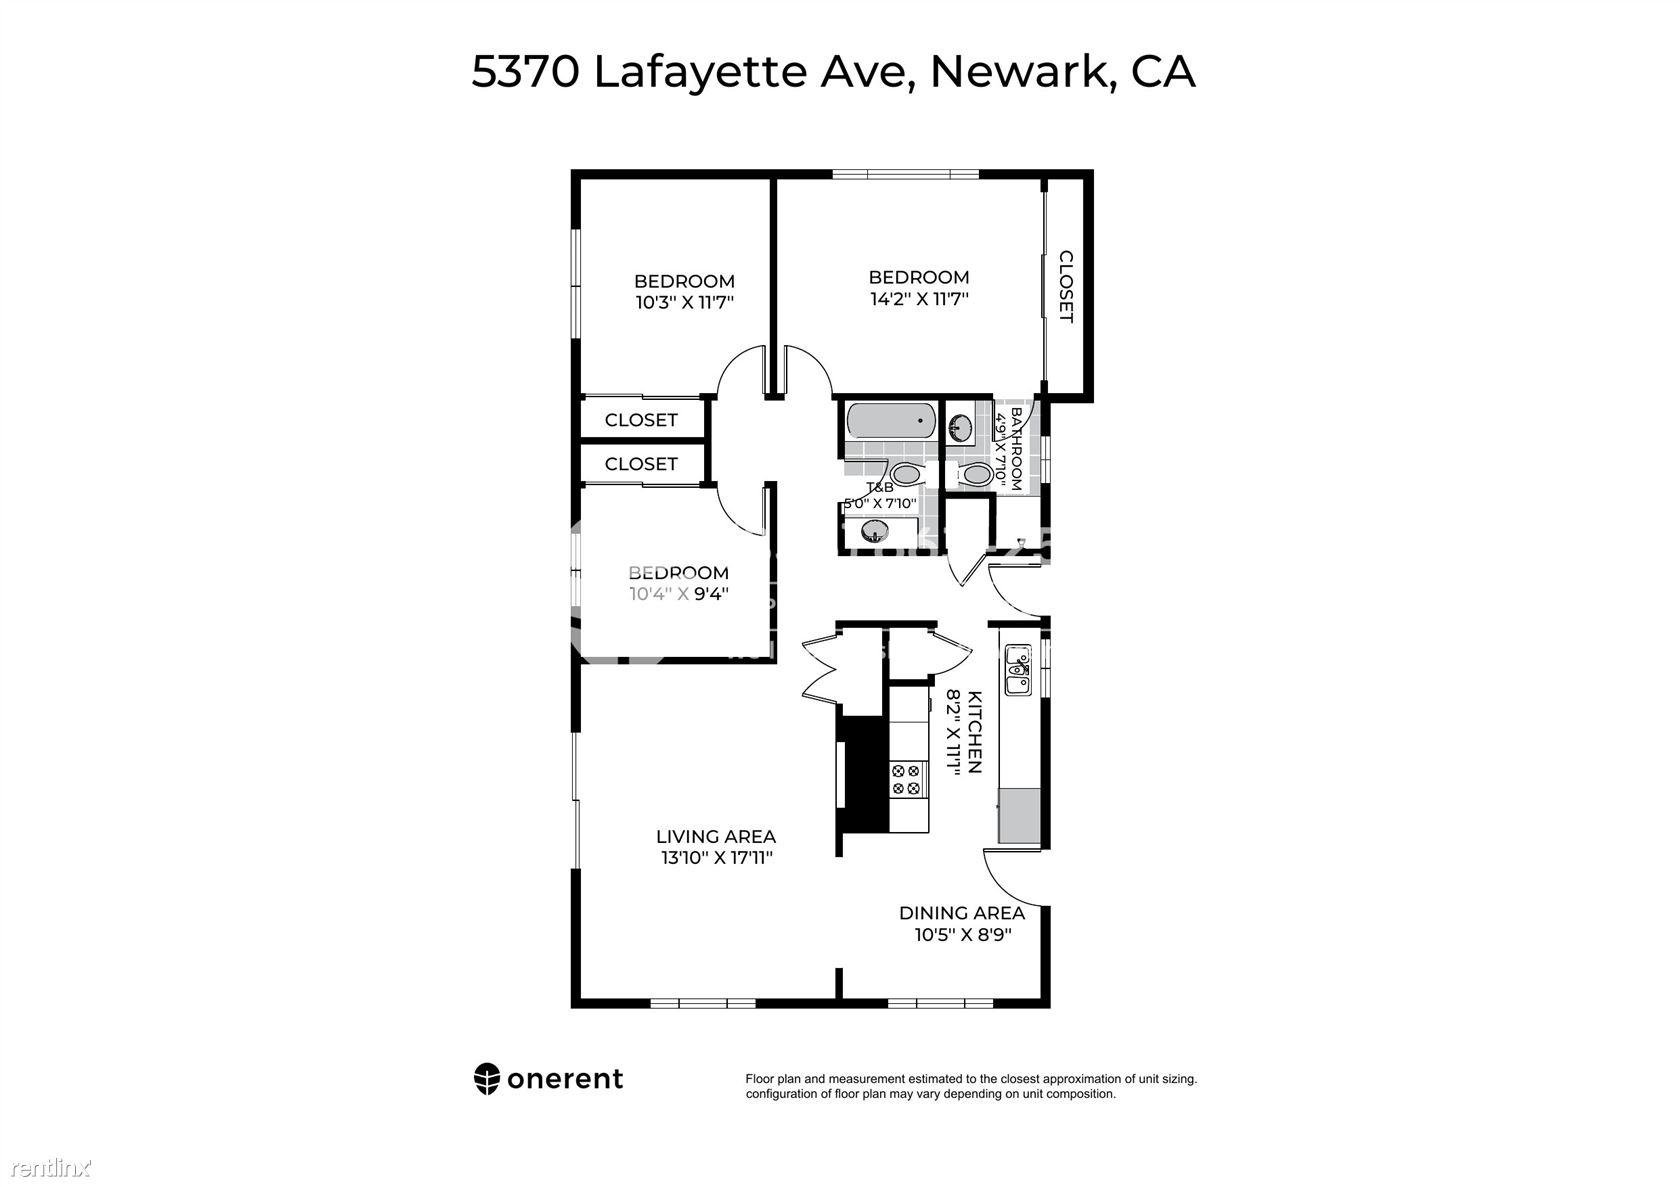 5370 Lafayette Ave